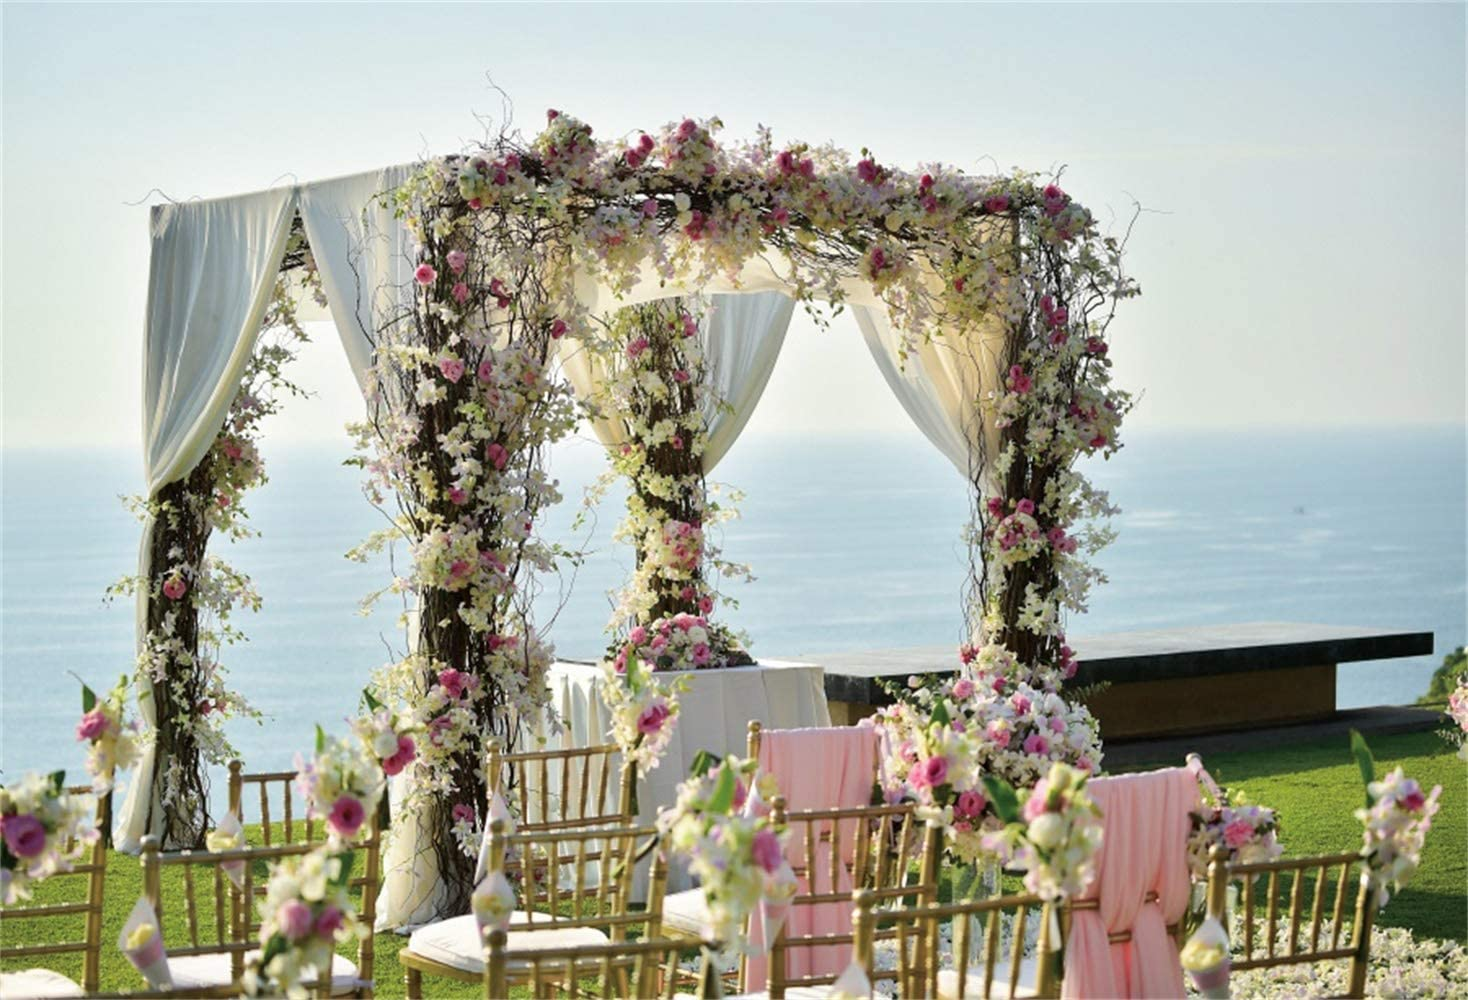 Leowefowa Seaside Wedding Ceremony Scene Vinyl 12x8ft Photography Background Bridal Party Backdrops Bride Groom Portrait Shoot Bridal Shower Wedding Photo Booth Props